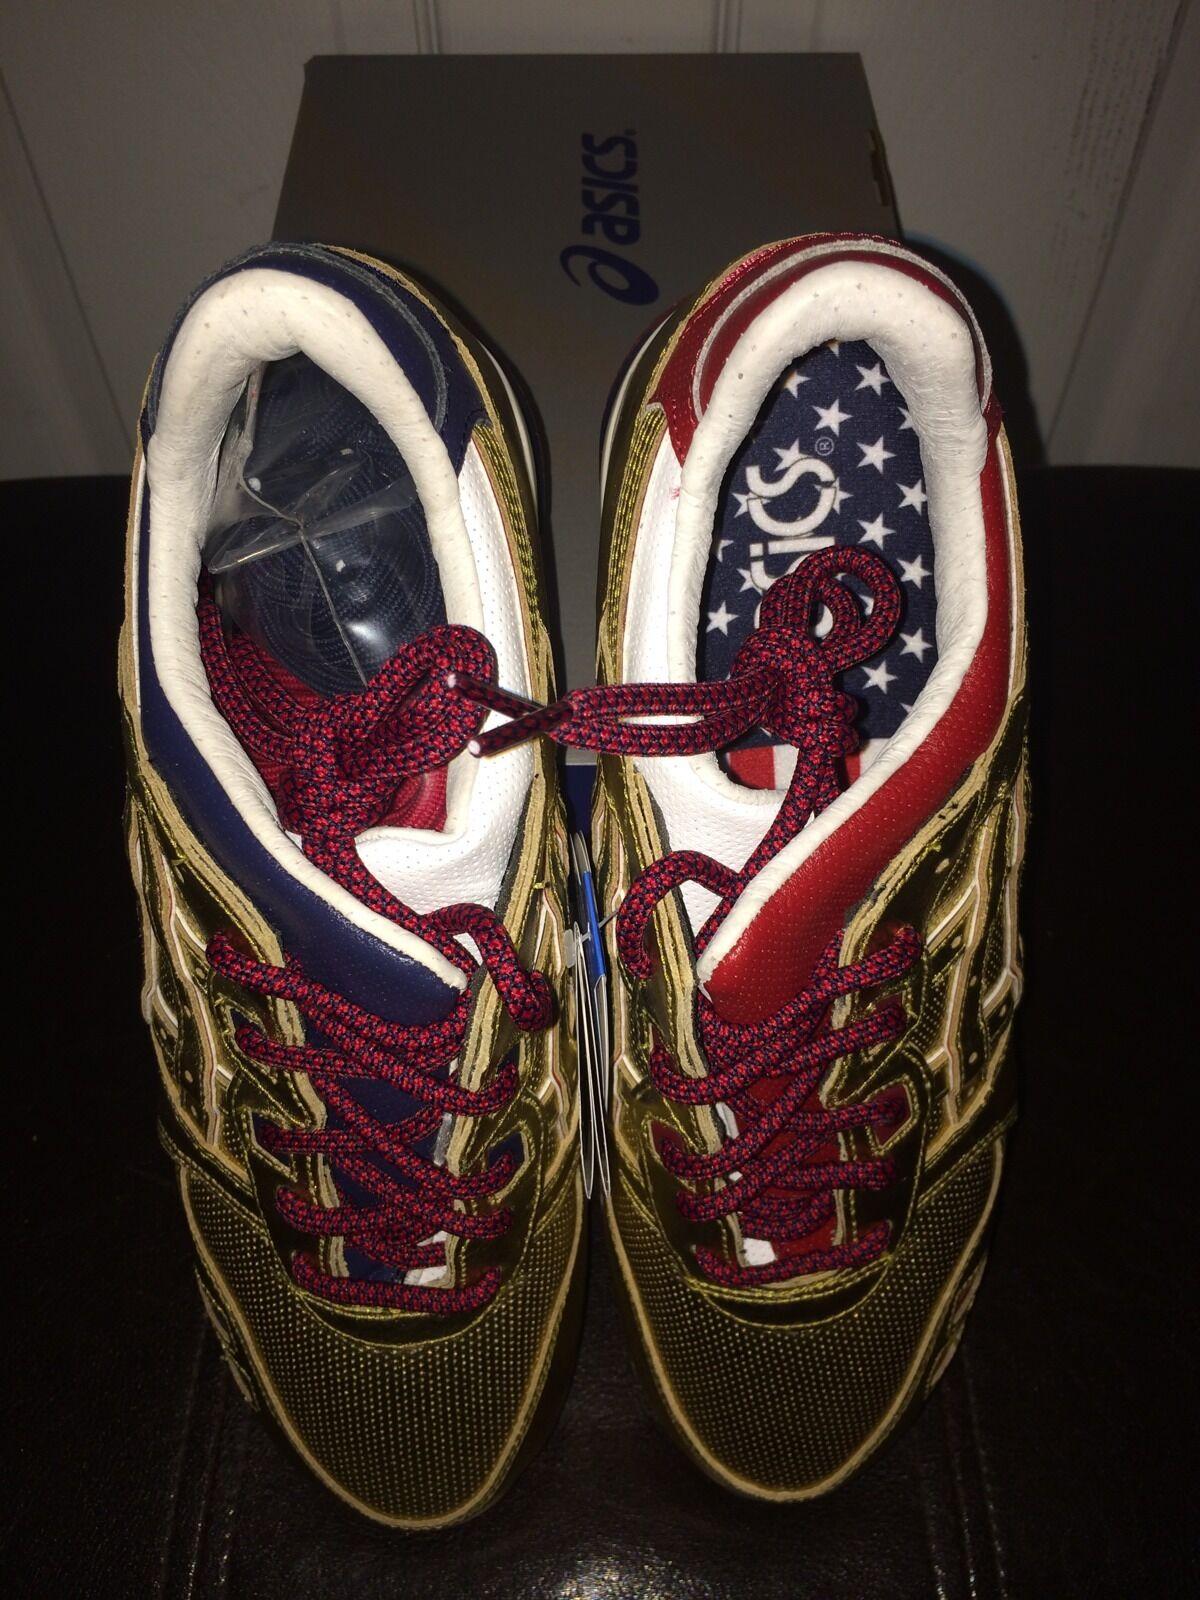 Asics Gel-Lyte III x Ronnie Fieg Fieg Fieg Kith KFE USA gold Medal Denim Sz 10 91c70e